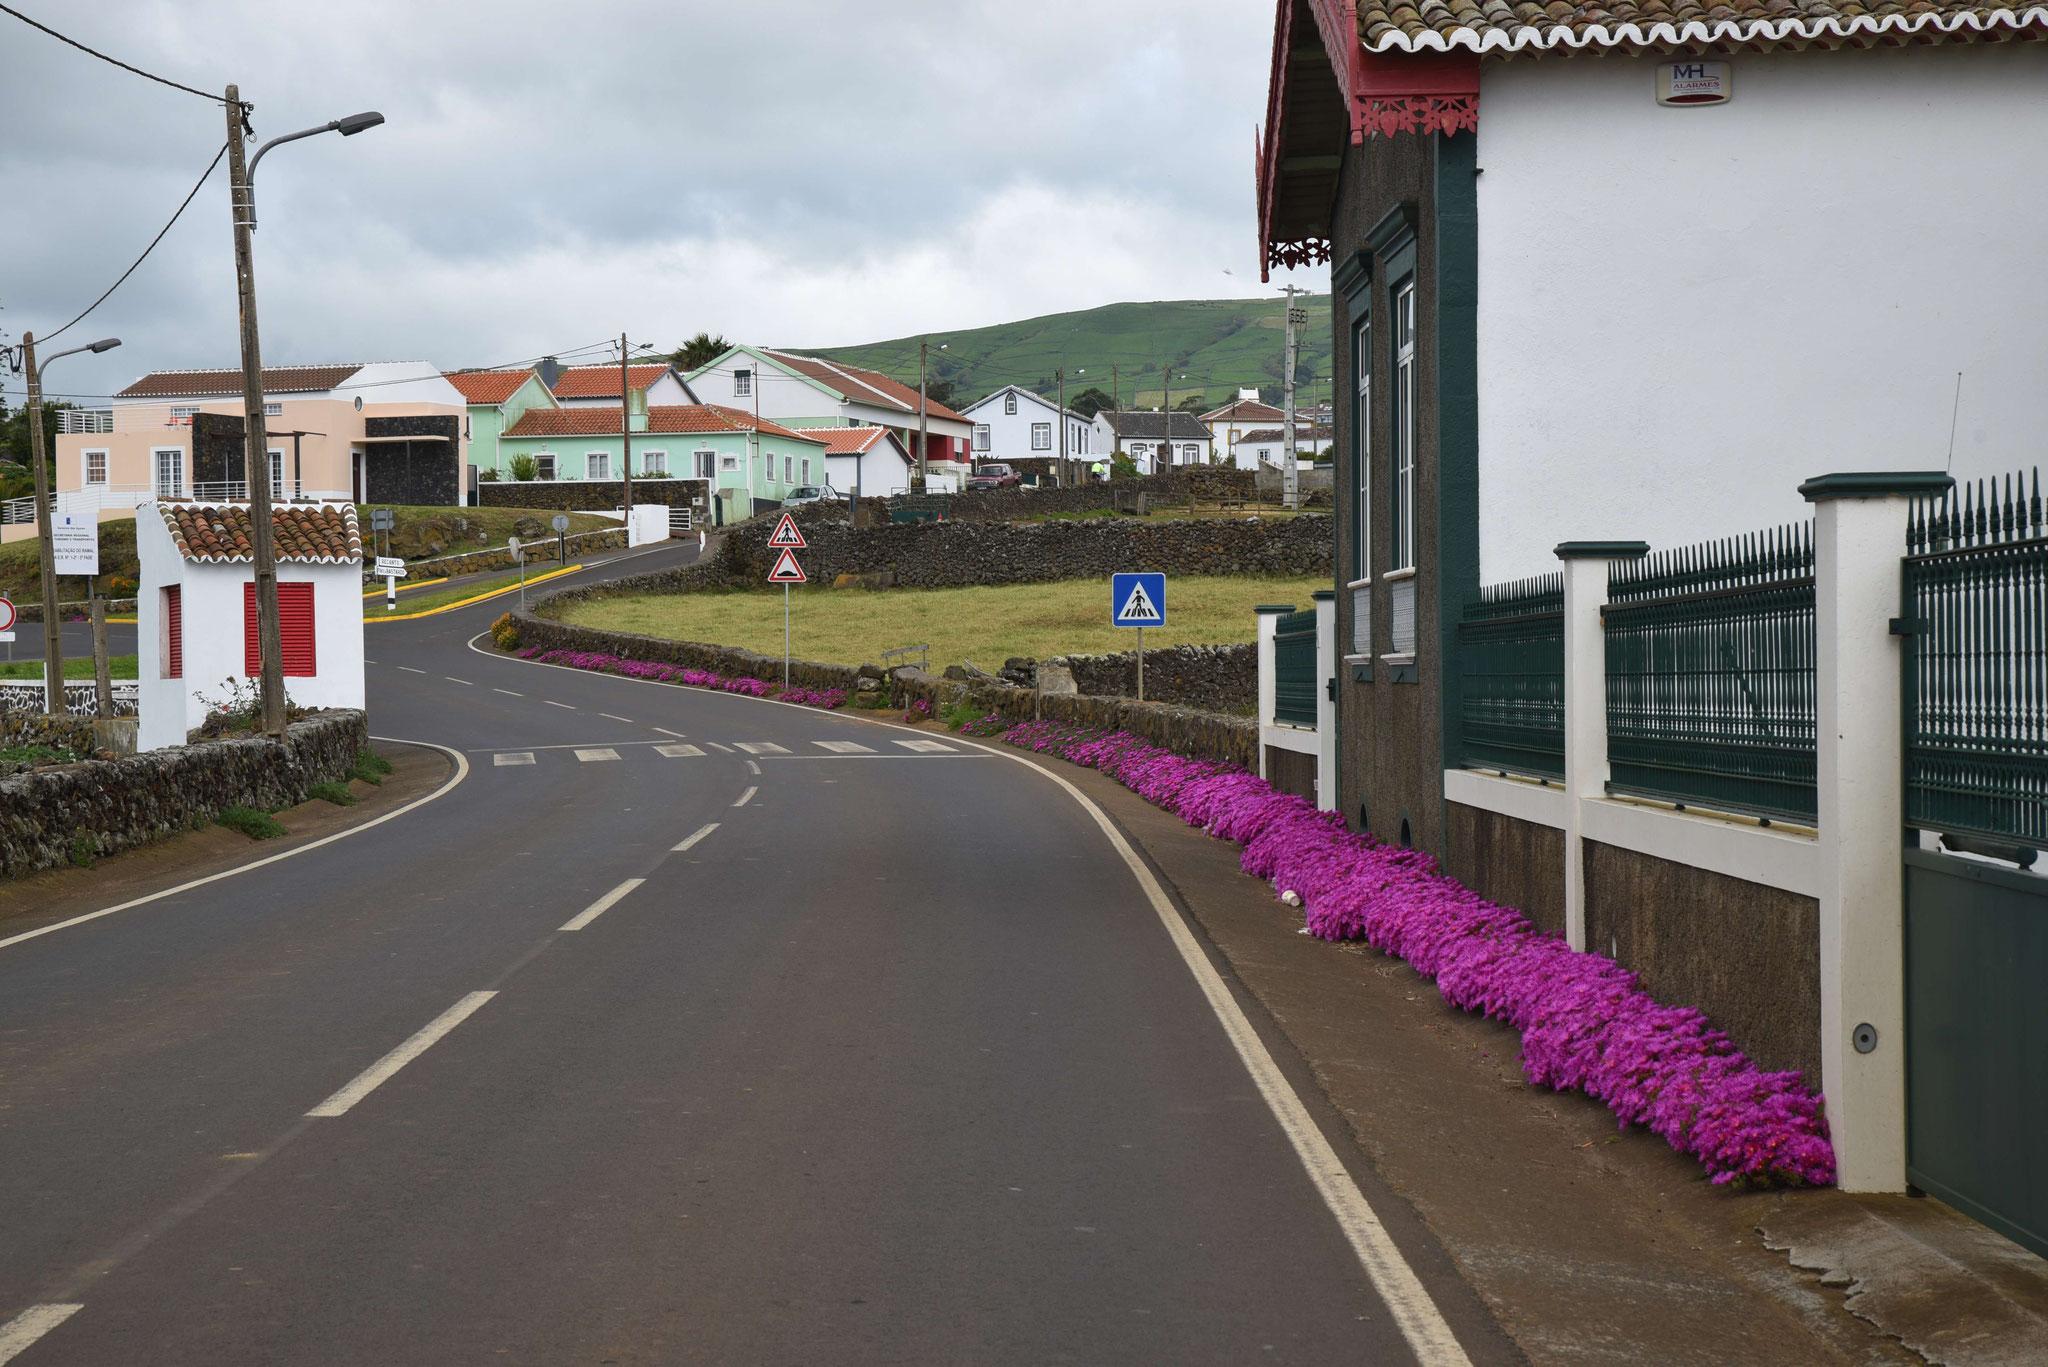 Schöne Straßenrandbepflanzung